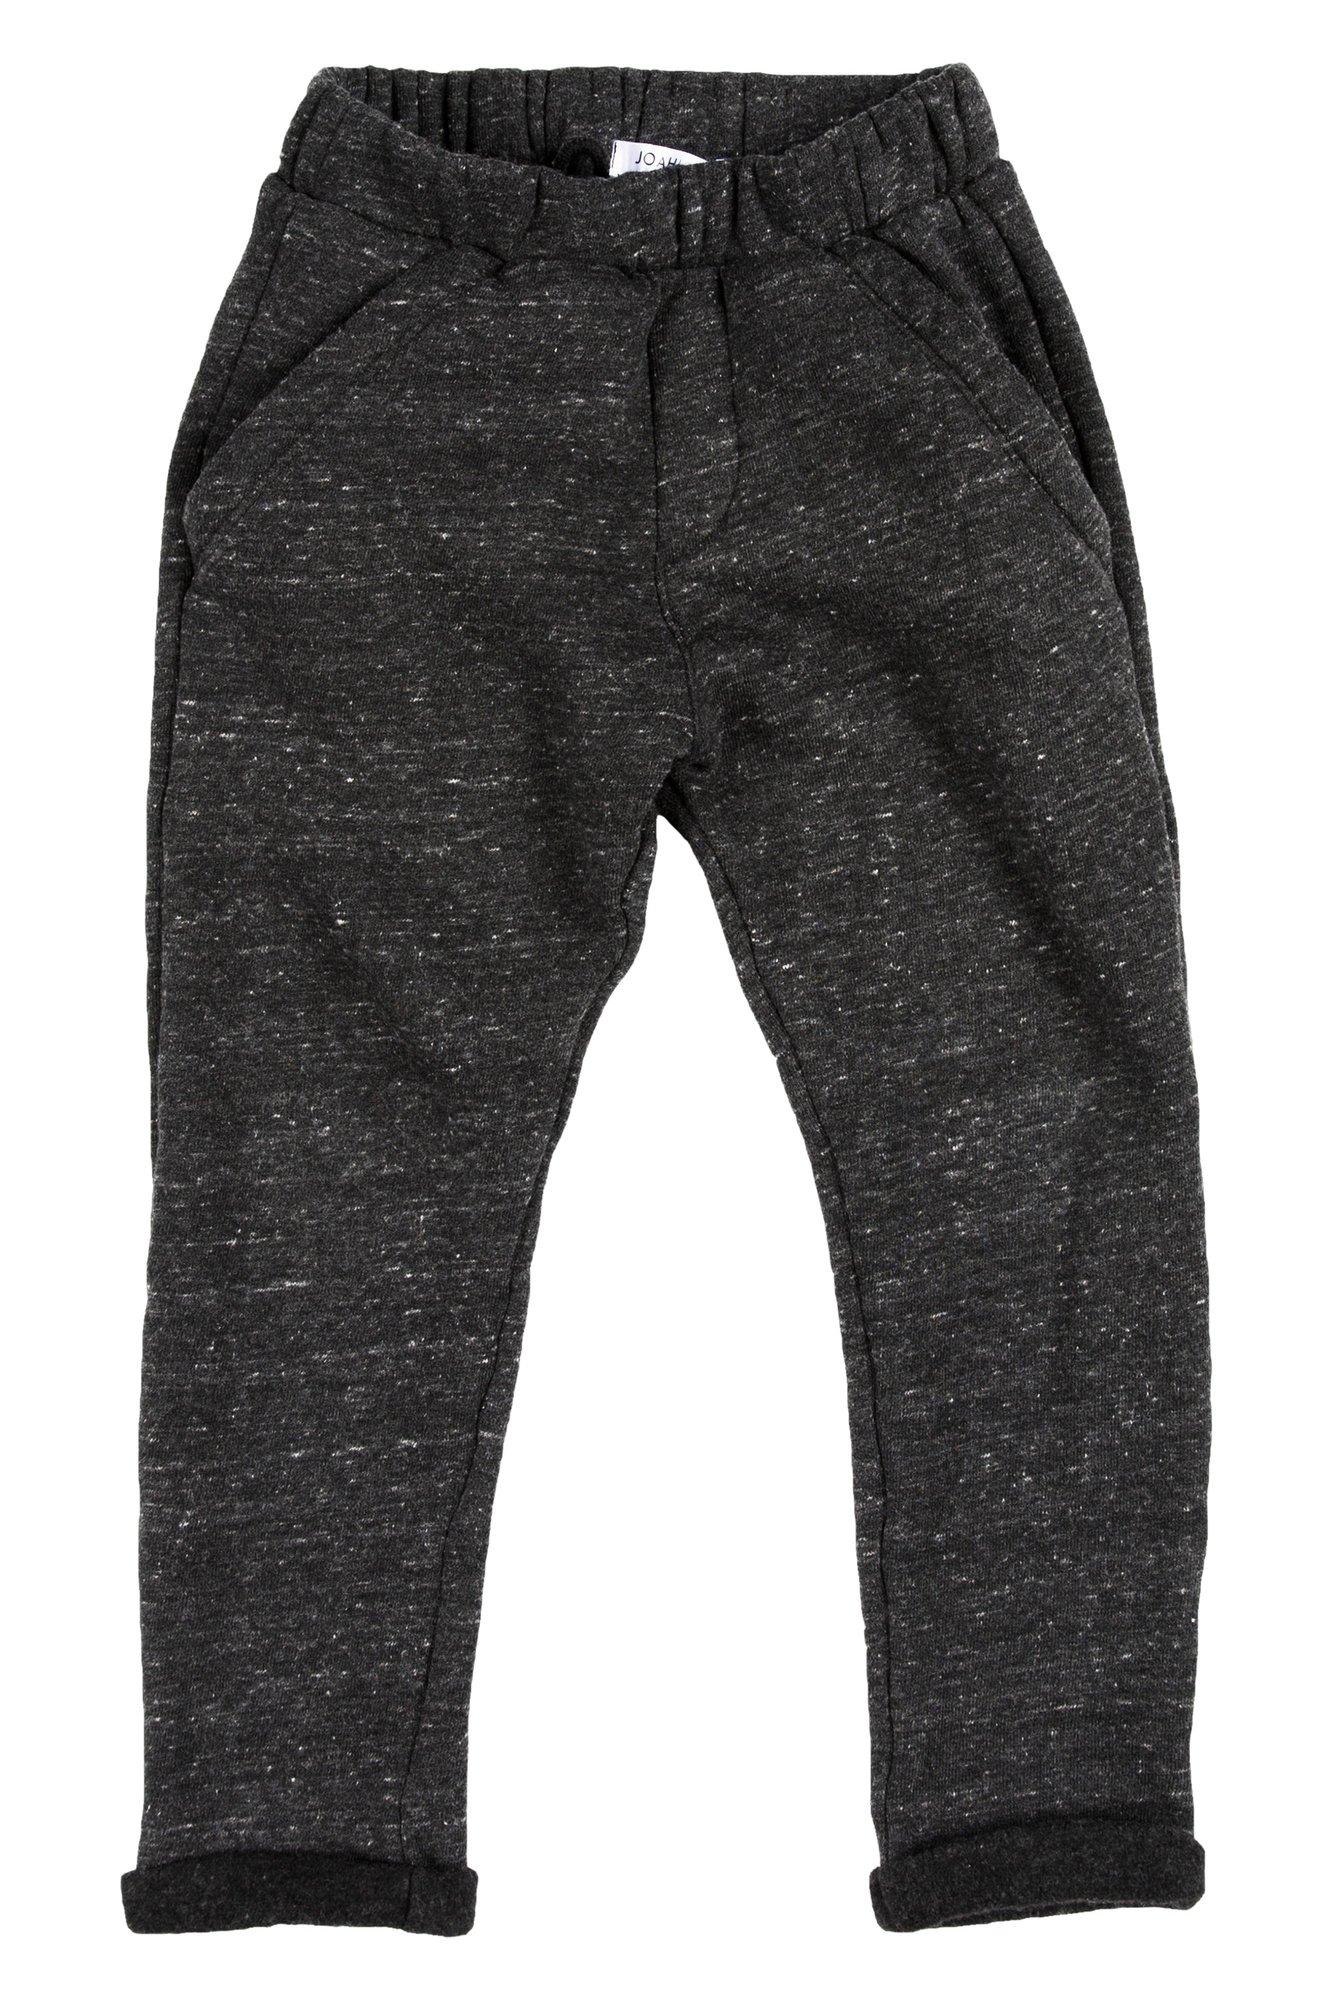 Joah Love Joss FLC Pant In Charcoal, 2